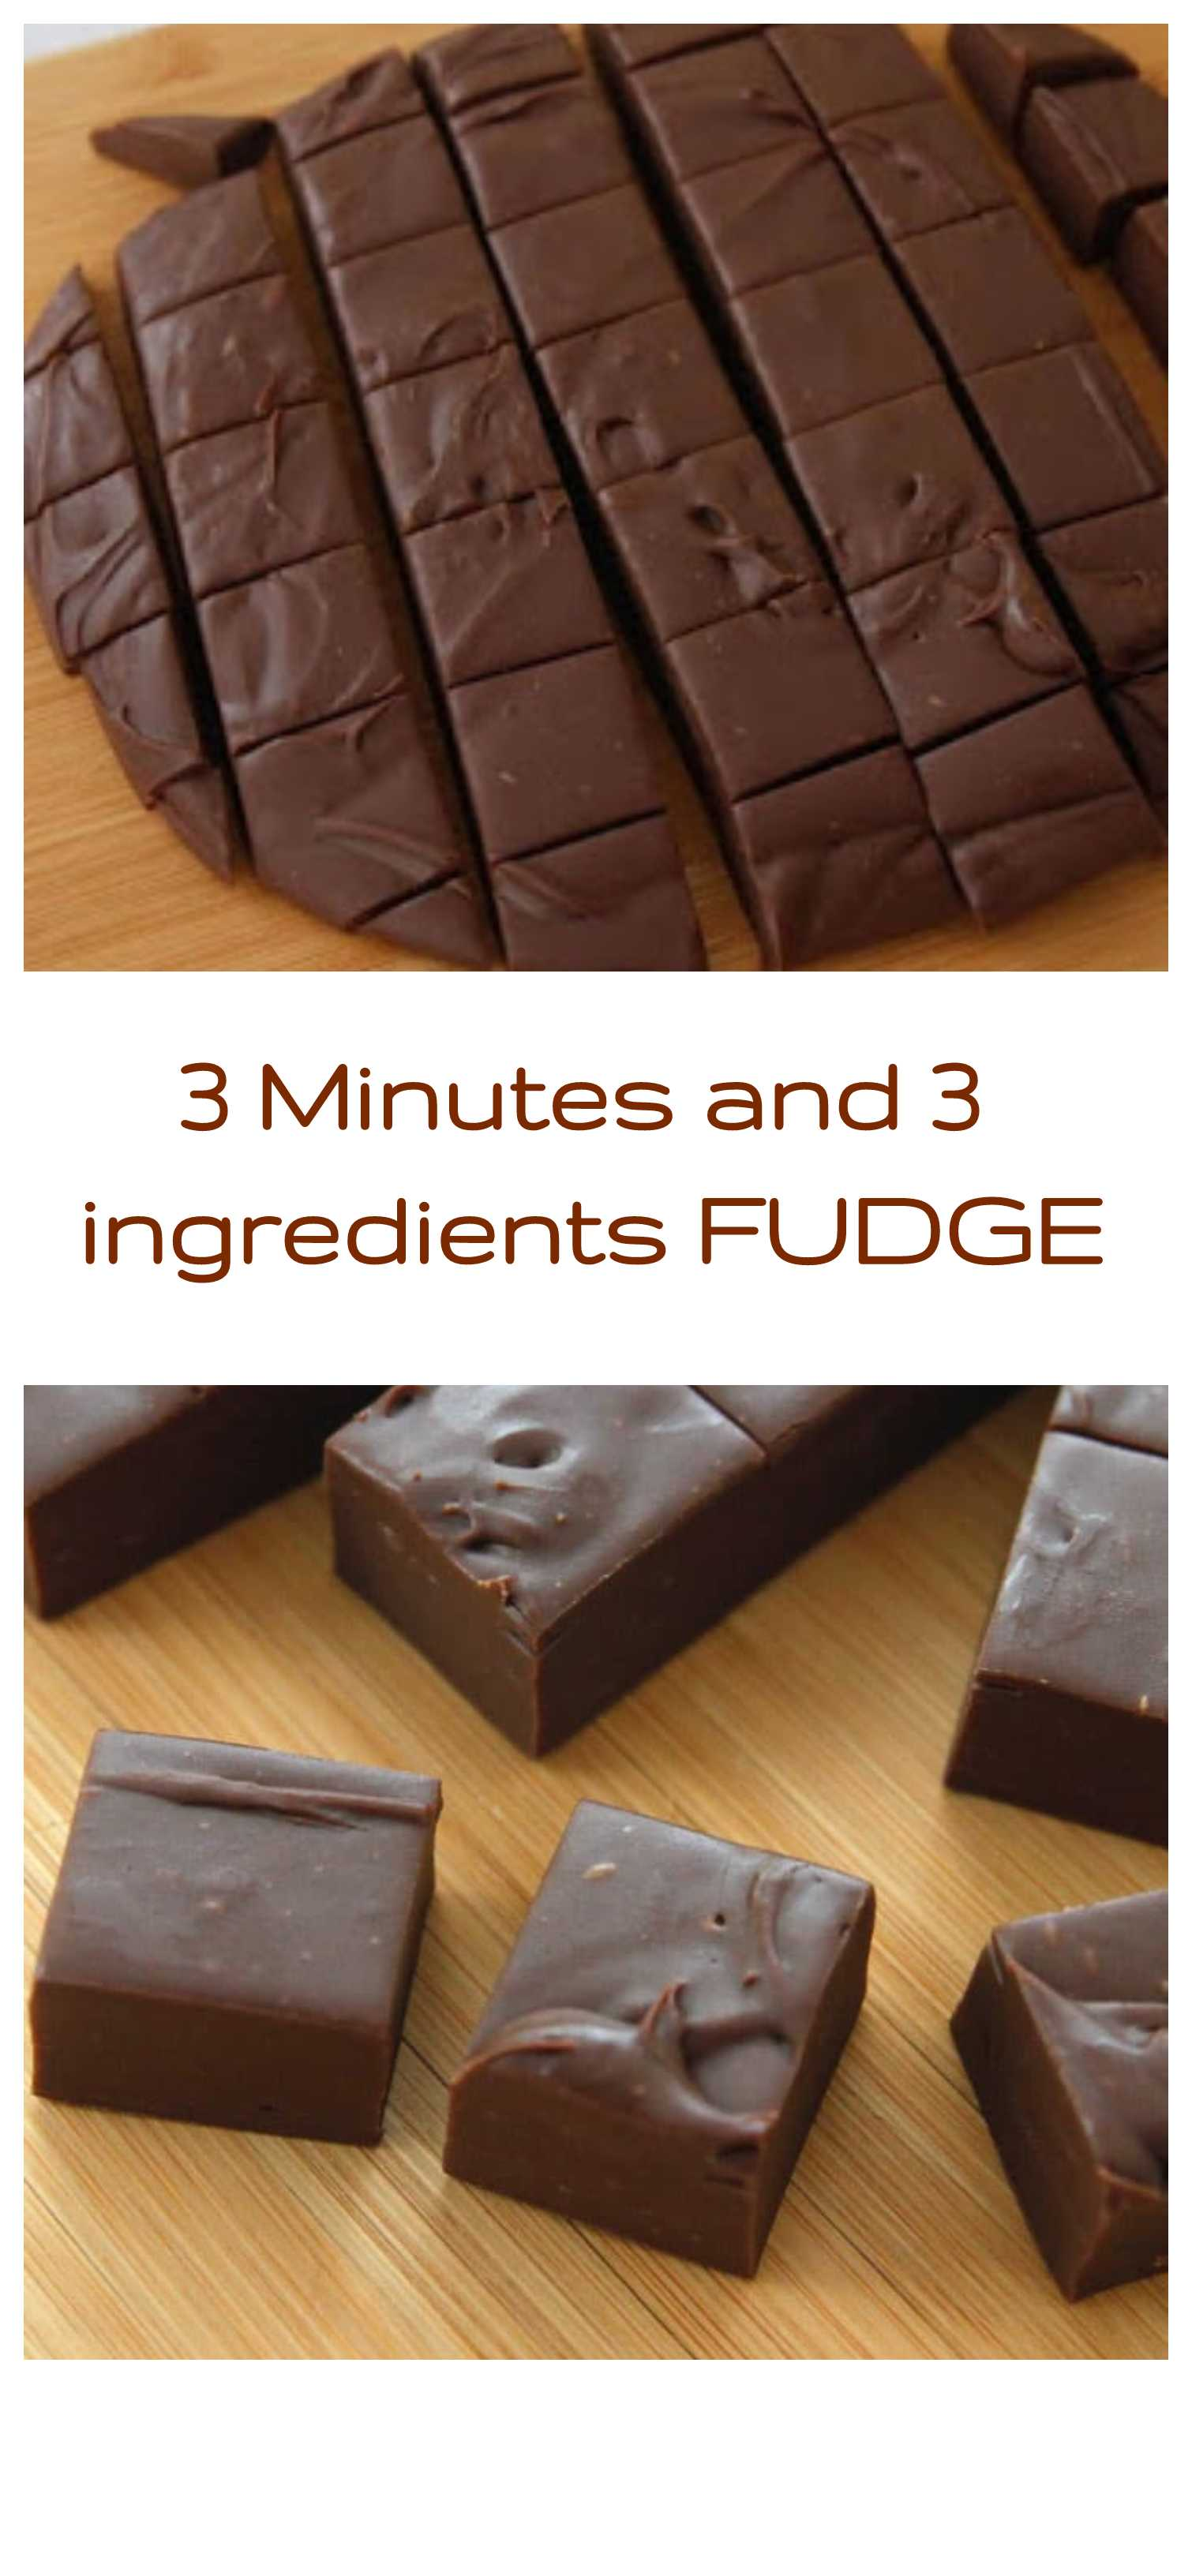 3 Minutes and 3 ingredients FUDGE